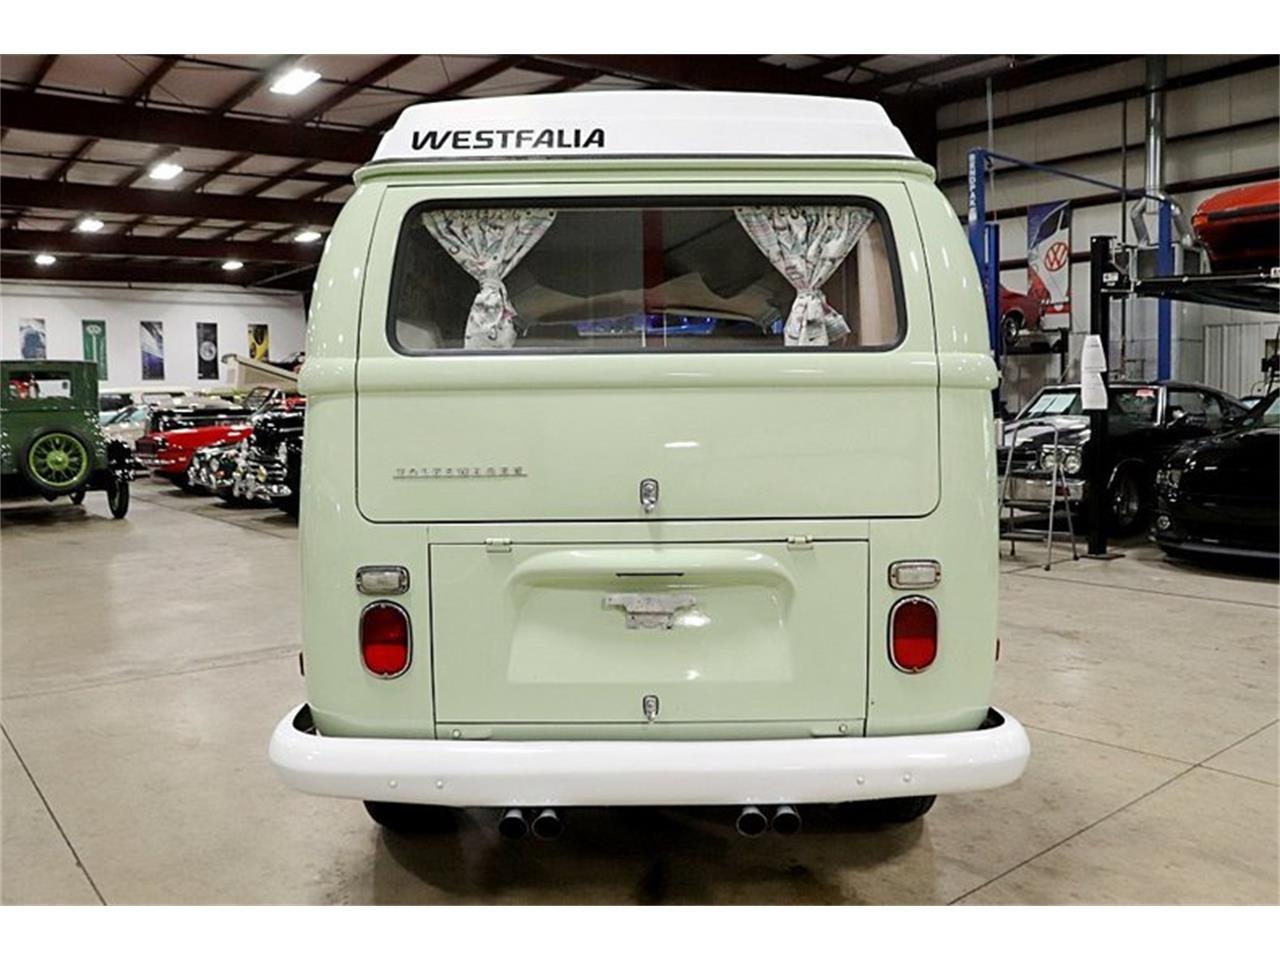 Large Picture of 1969 Westfalia Camper - $26,900.00 - Q5WZ